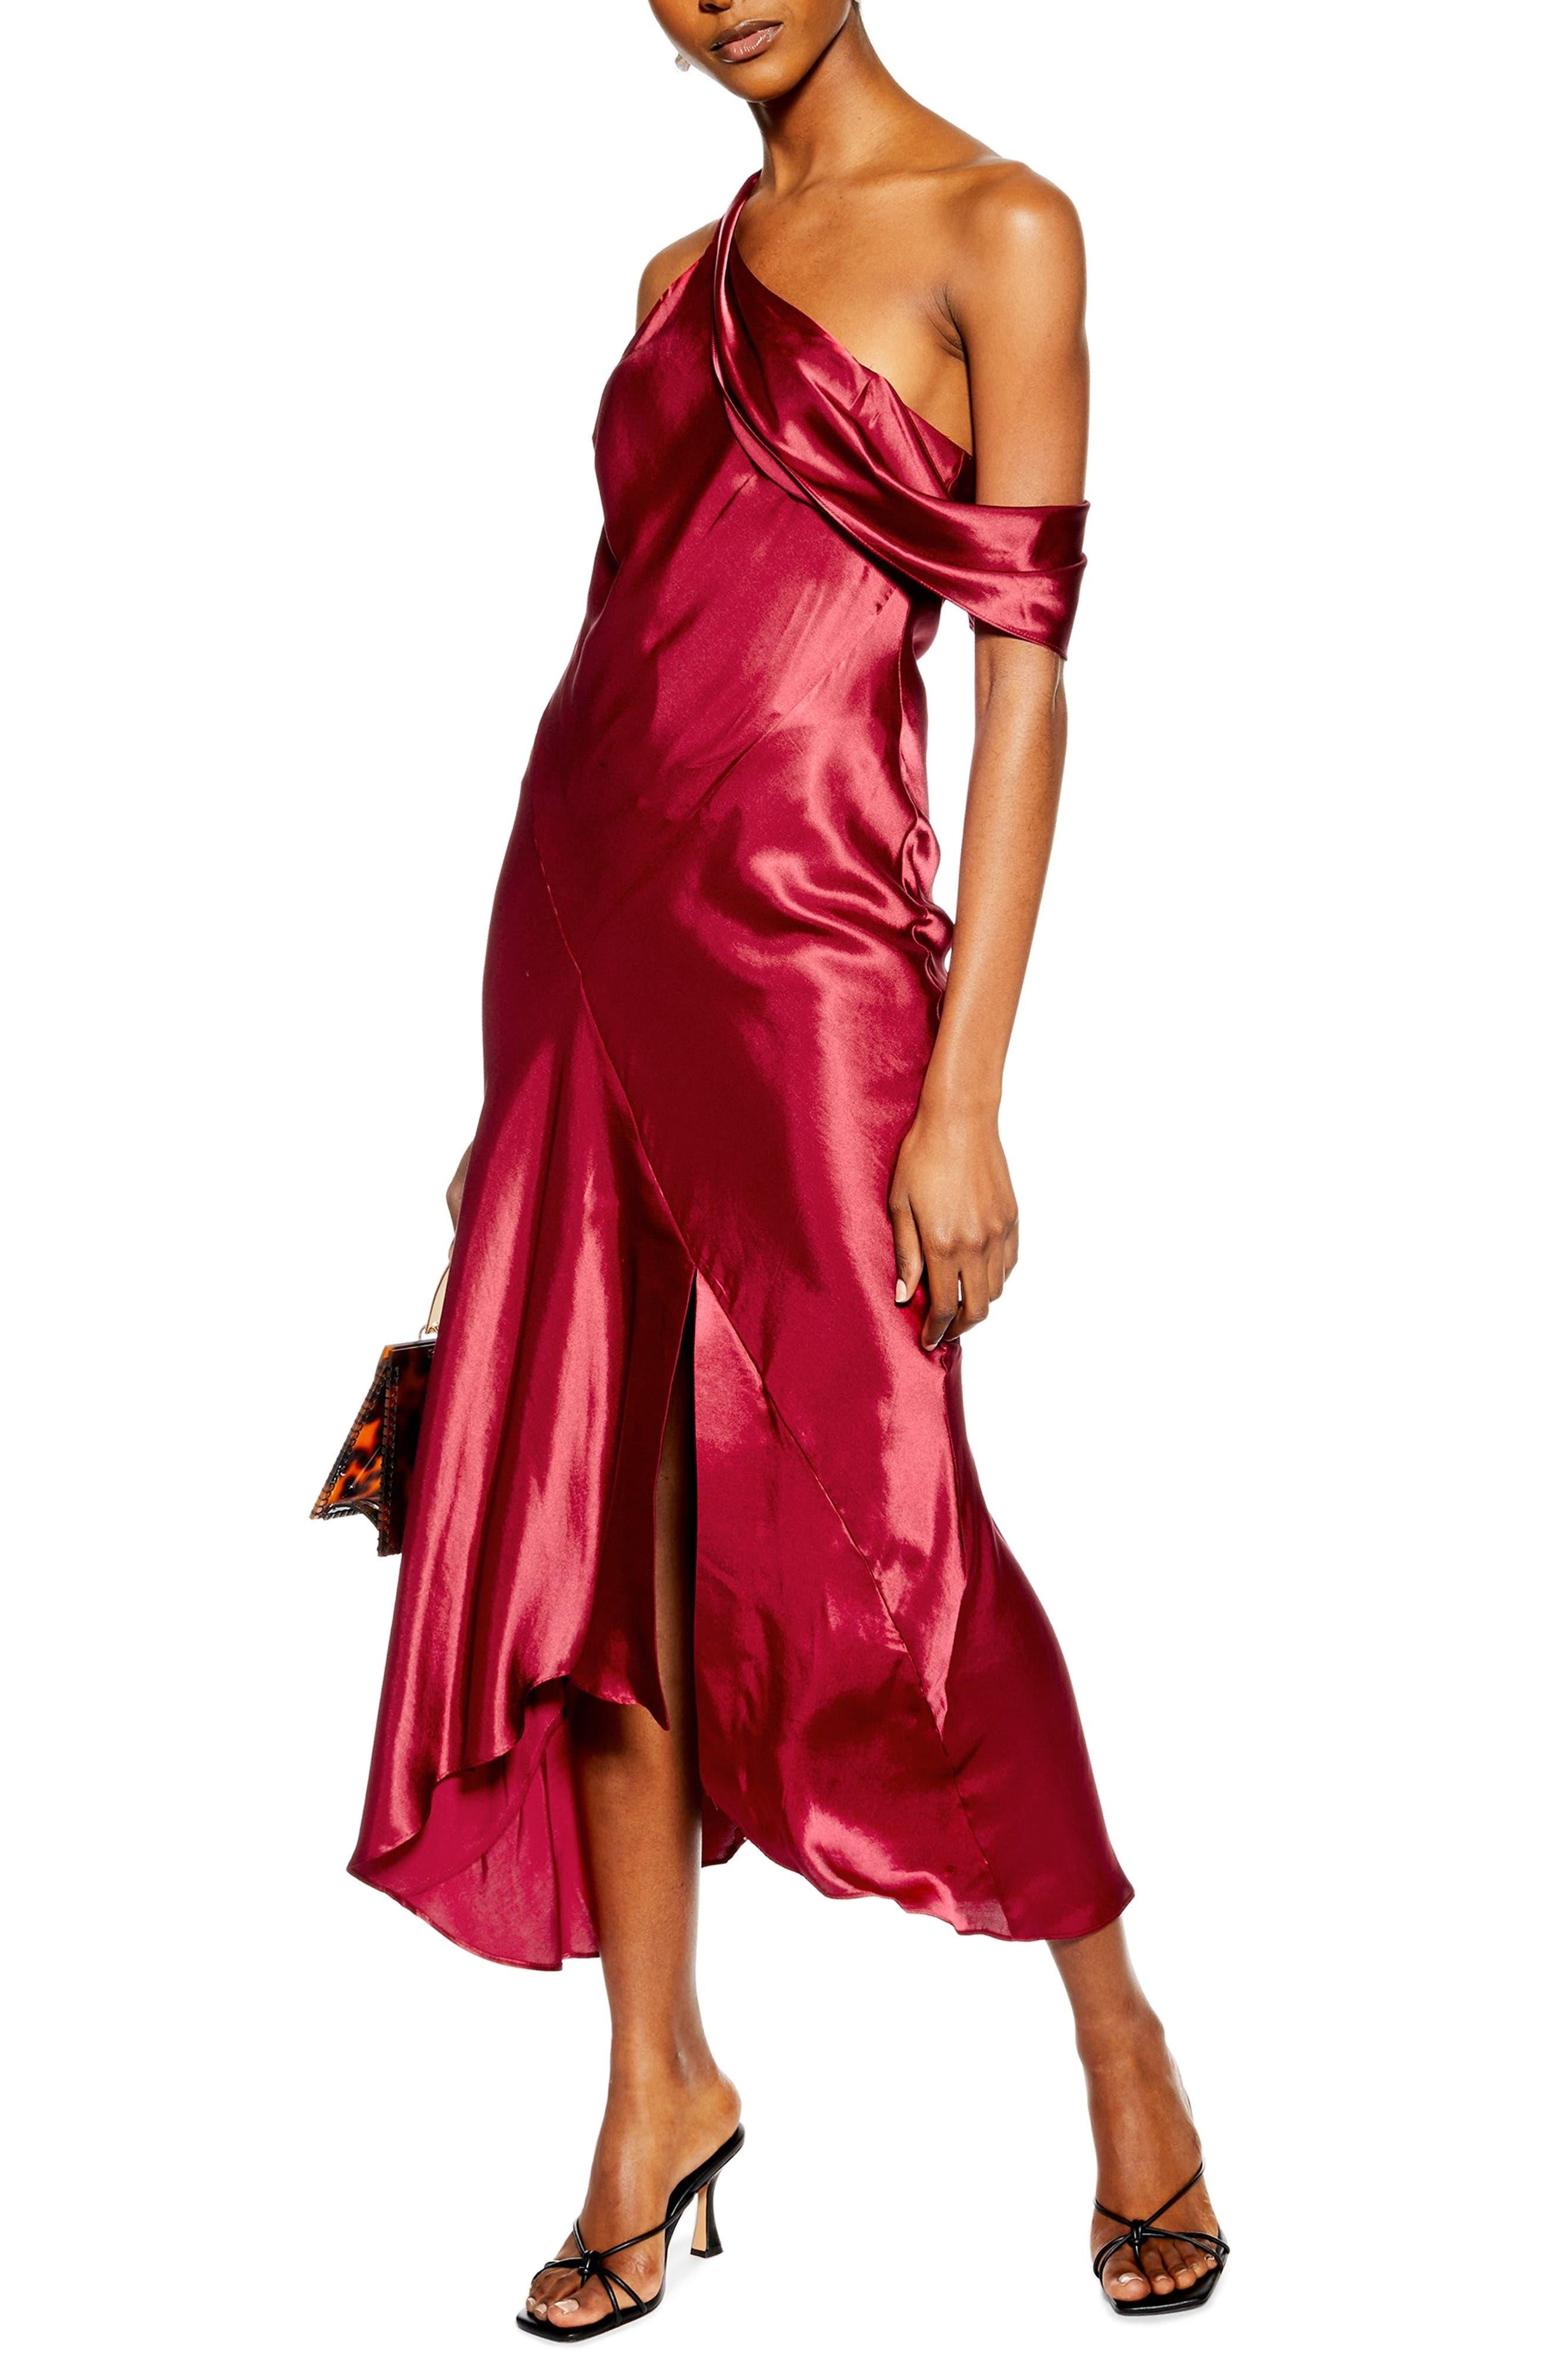 Topshop Asymmetrical Midi Dress, US (fits like 0-2) - Red